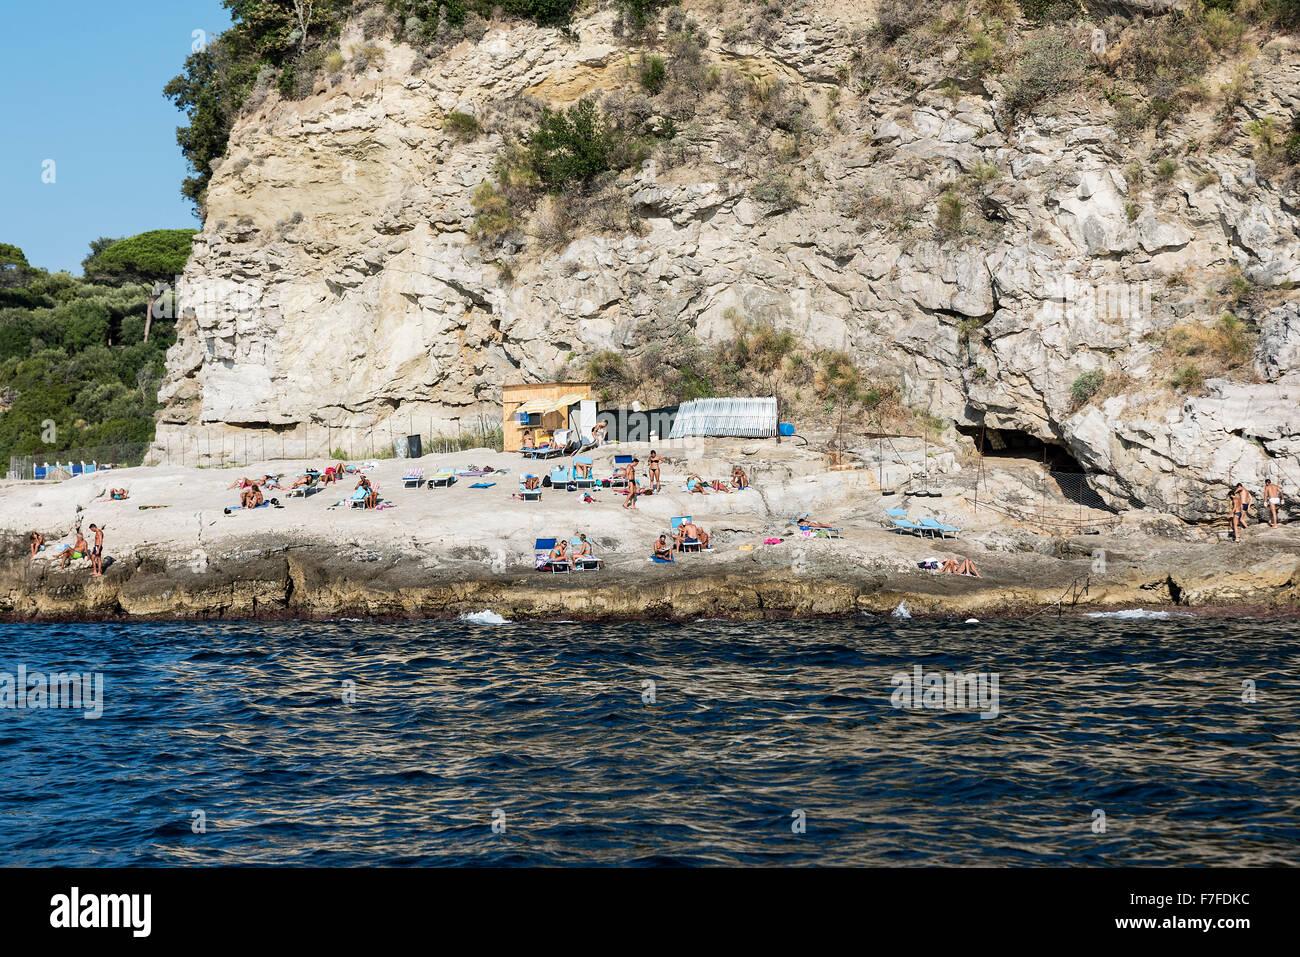 Sunbathers enjoy a rugged rock beach along the Sorrento coast, Compania, Italy - Stock Image